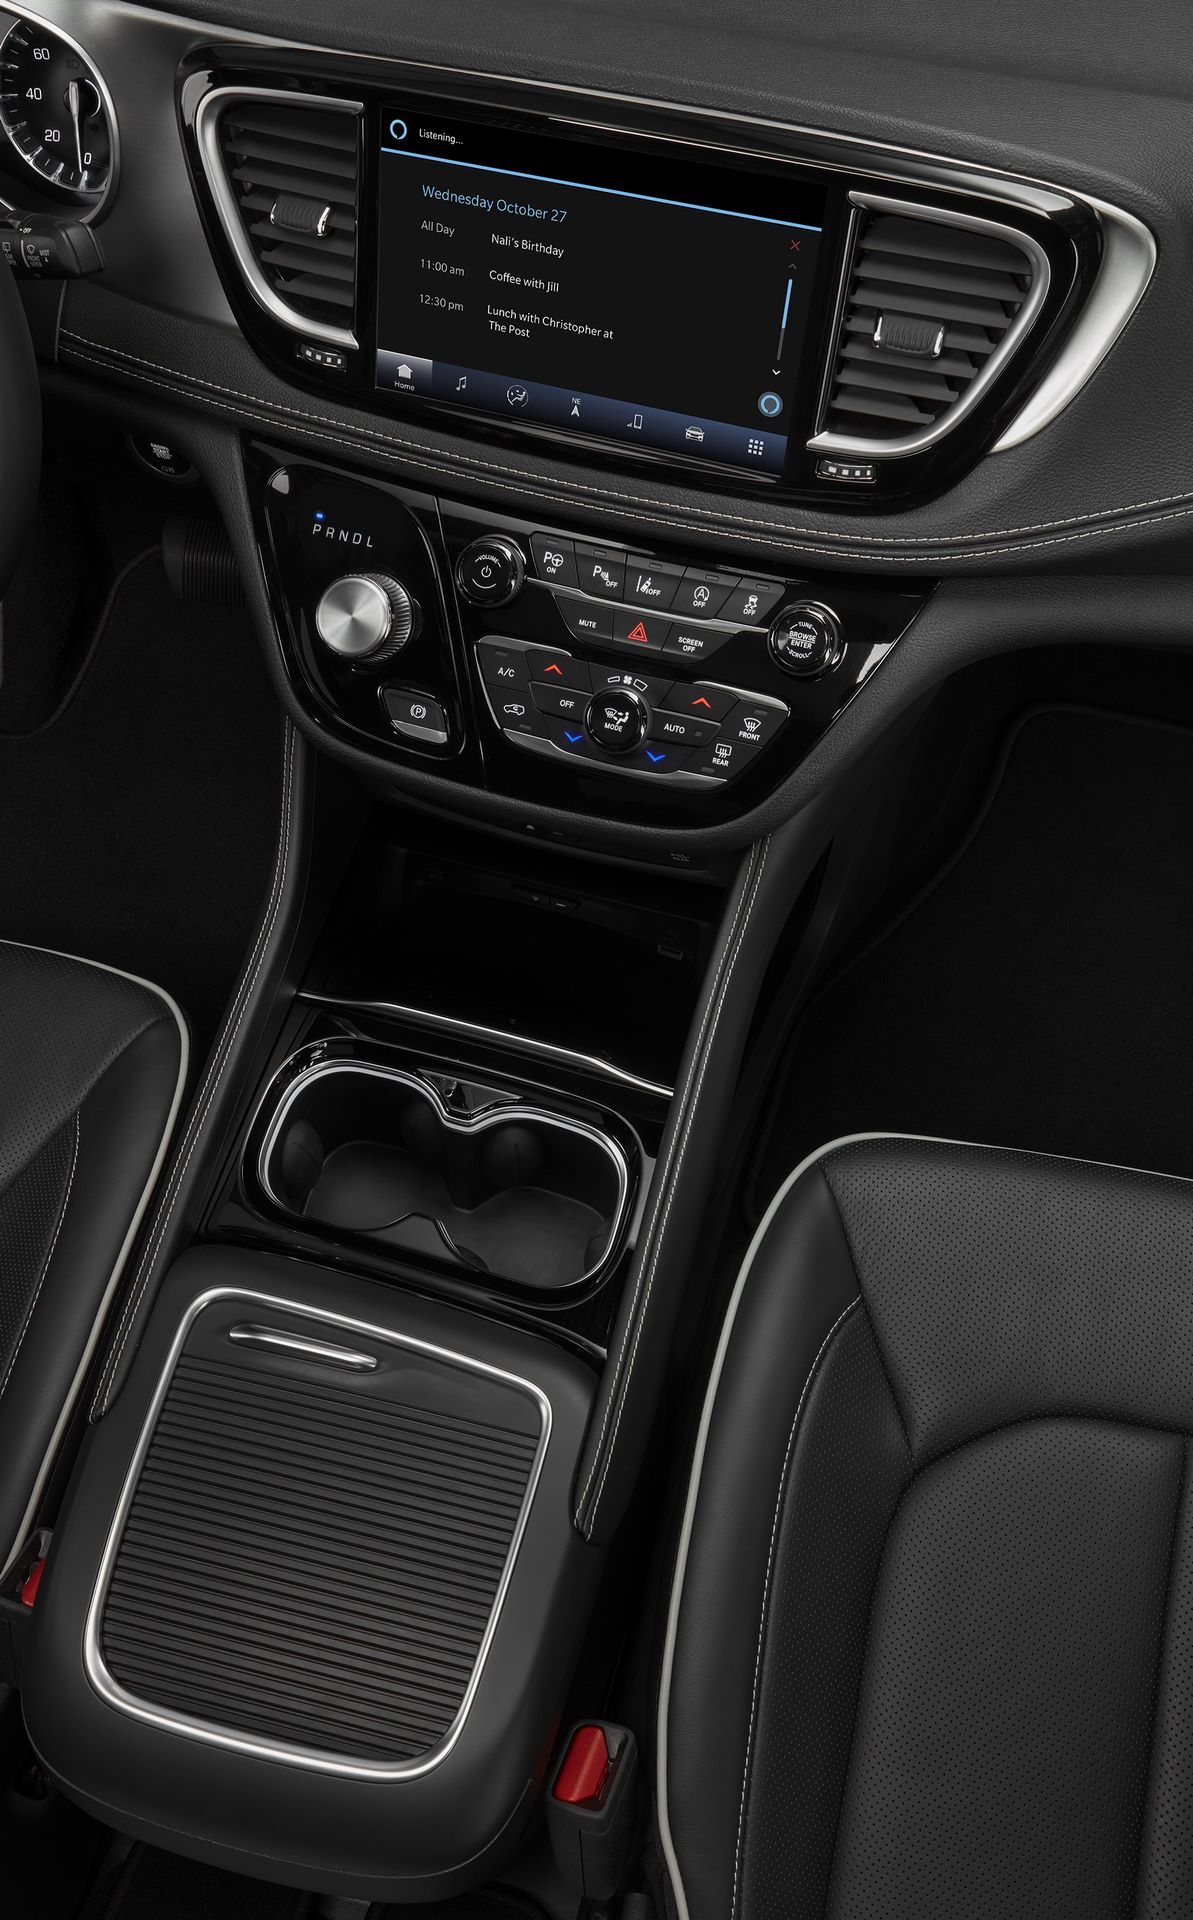 2021-Chrysler-Pacifica-142